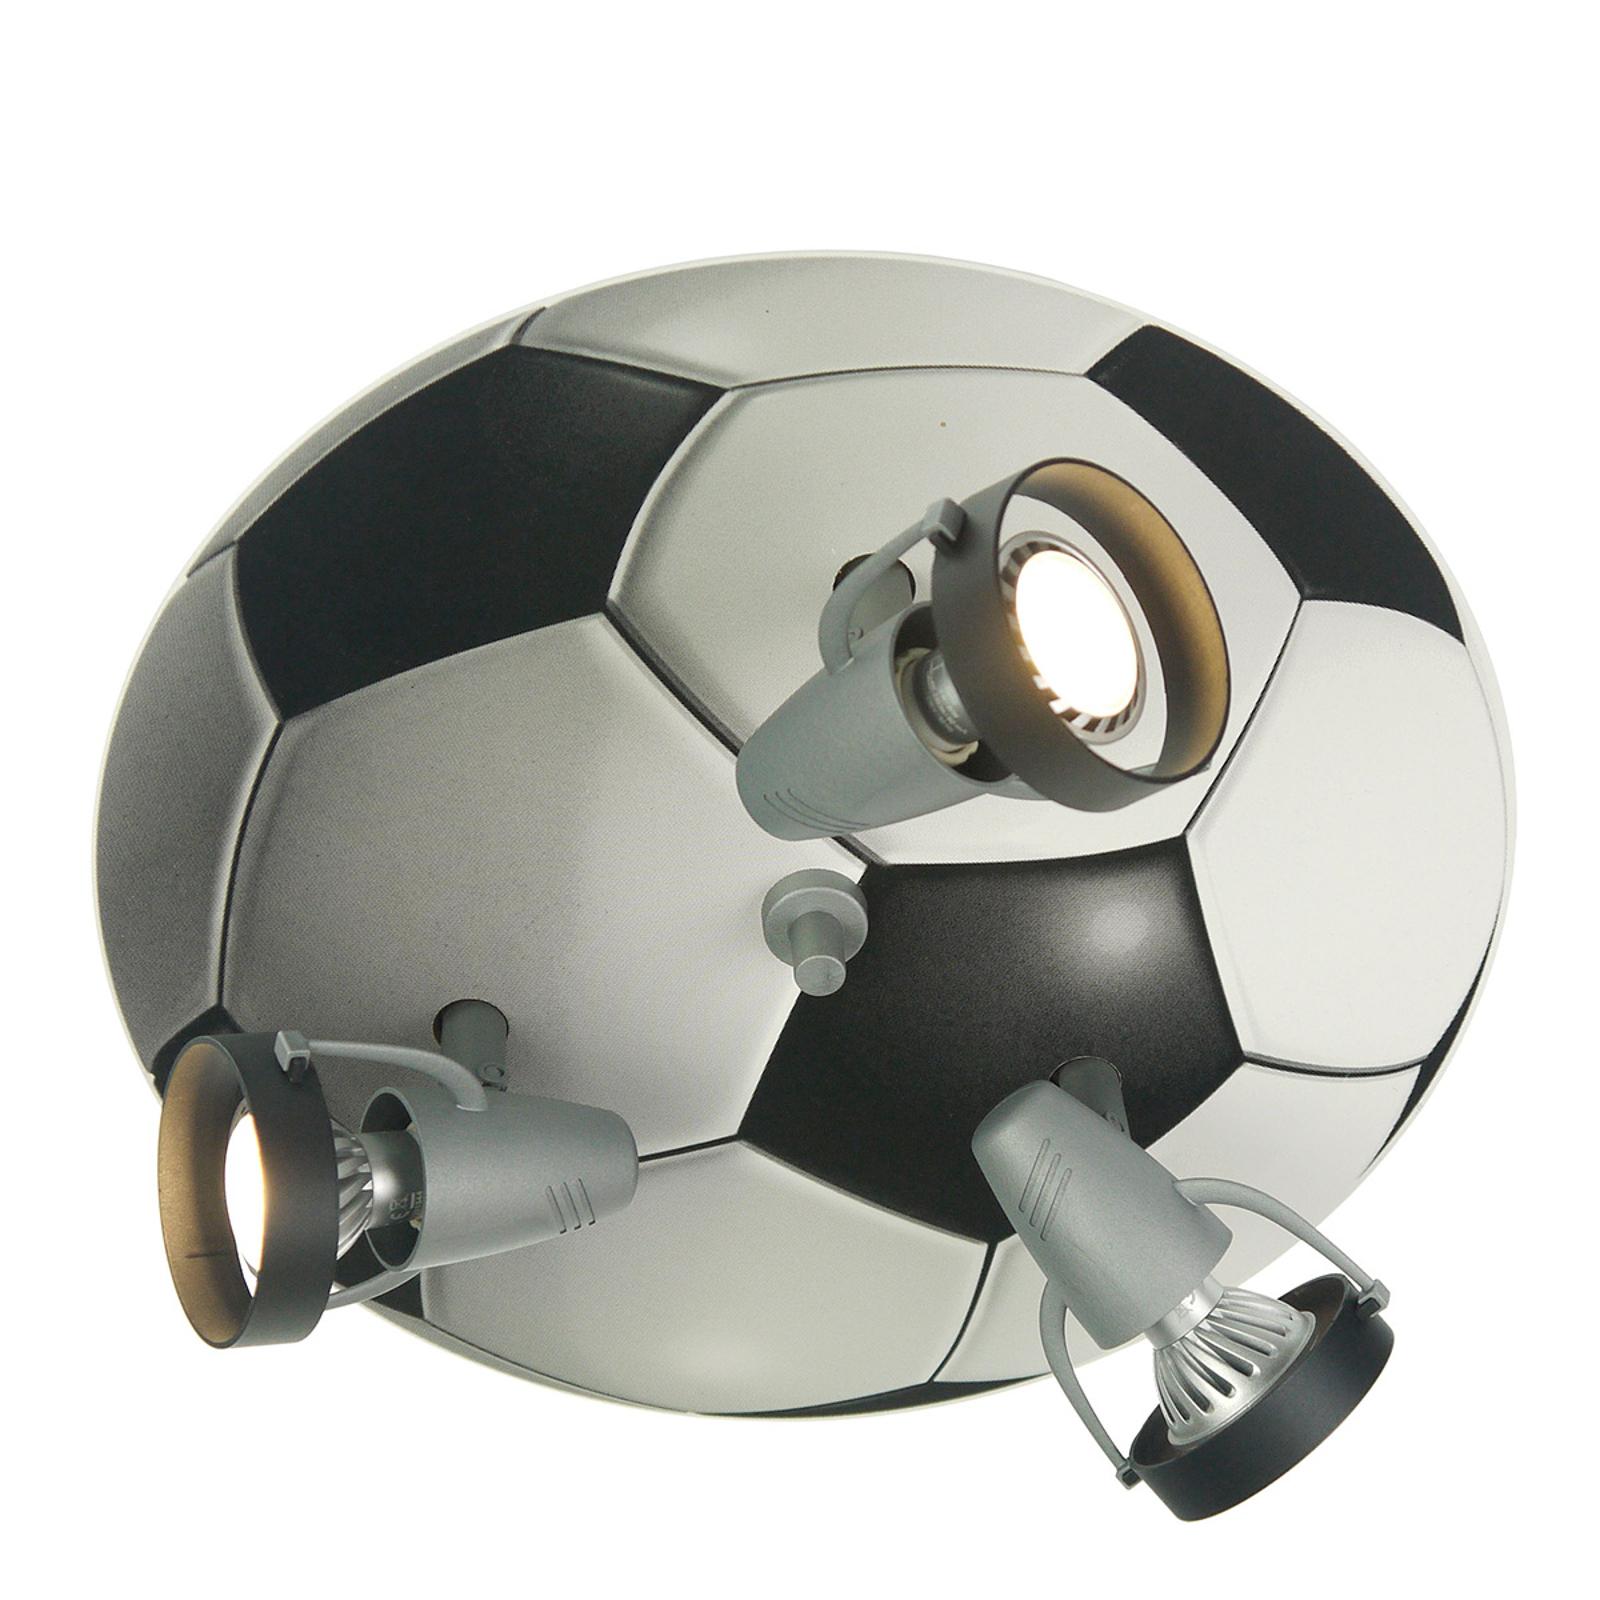 Lampa sufitowa Piłka nożna